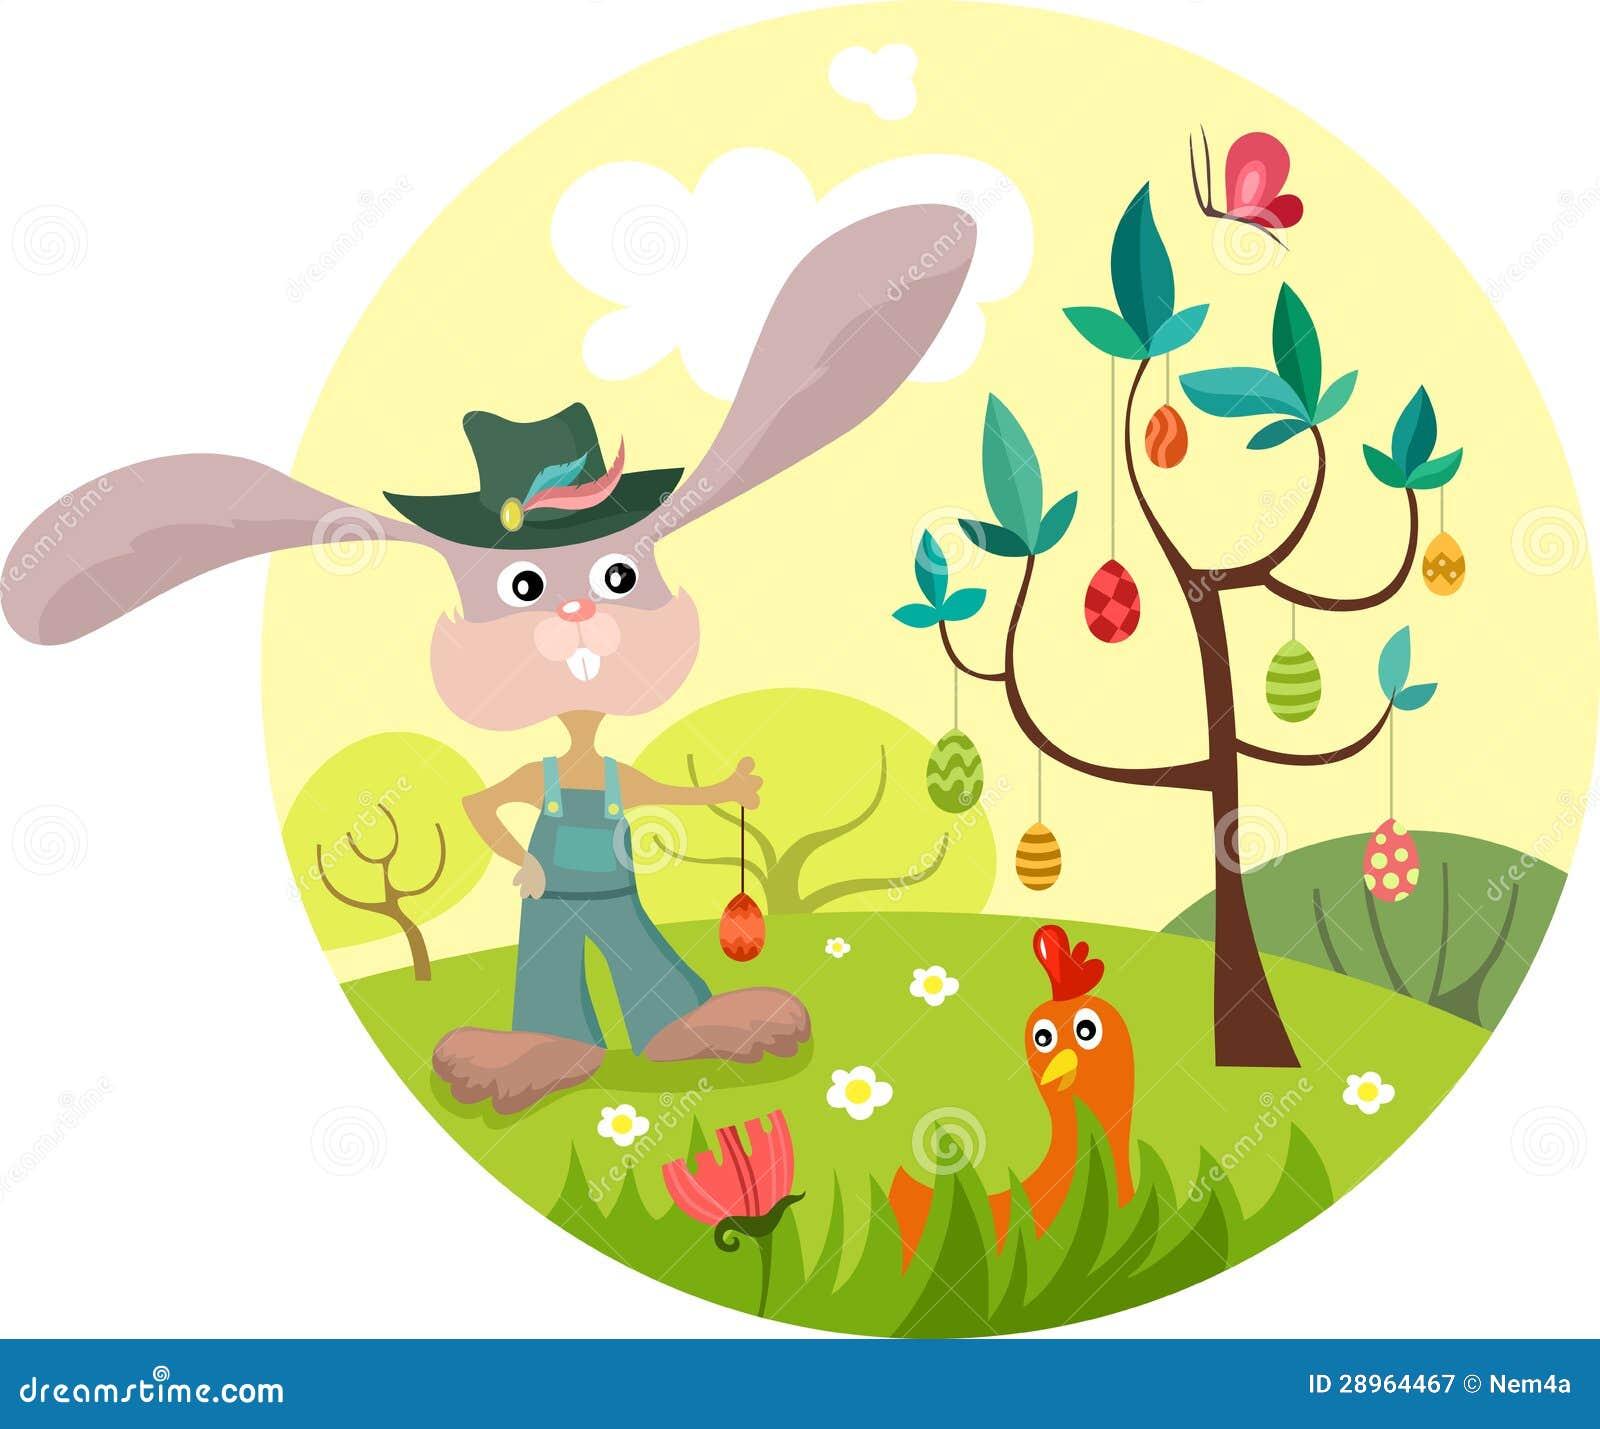 Wielkanocna ilustracja